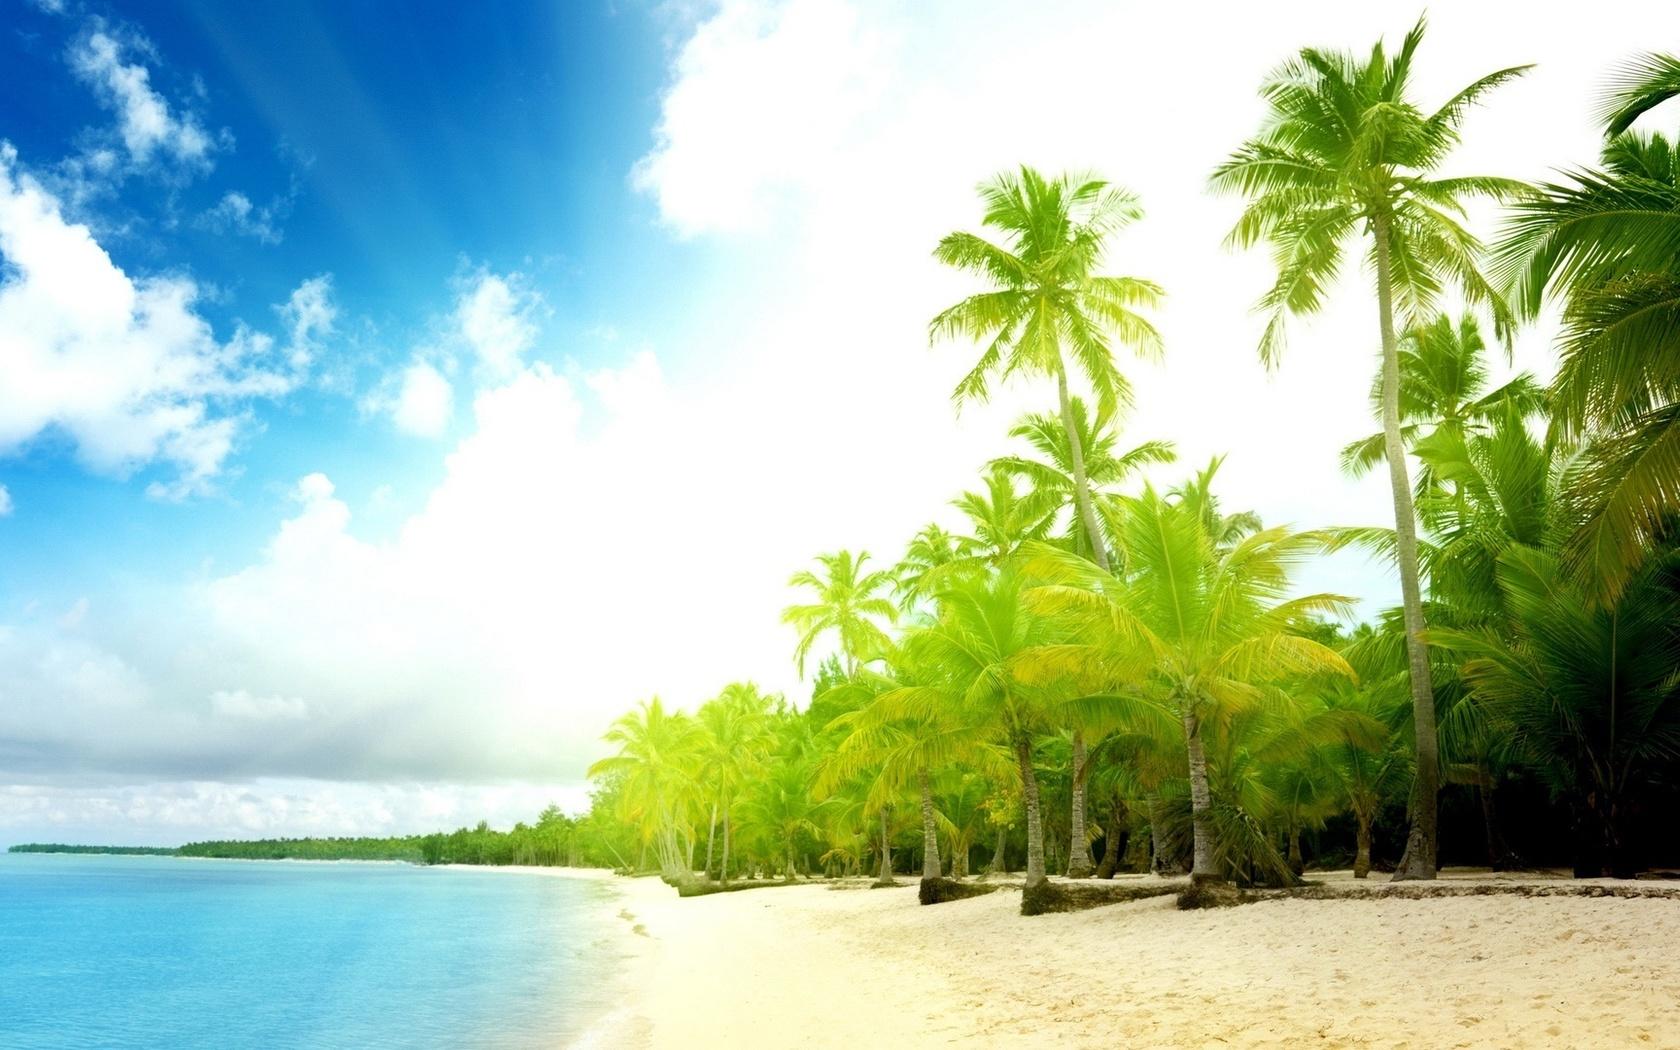 Картинки пляжа на заставку